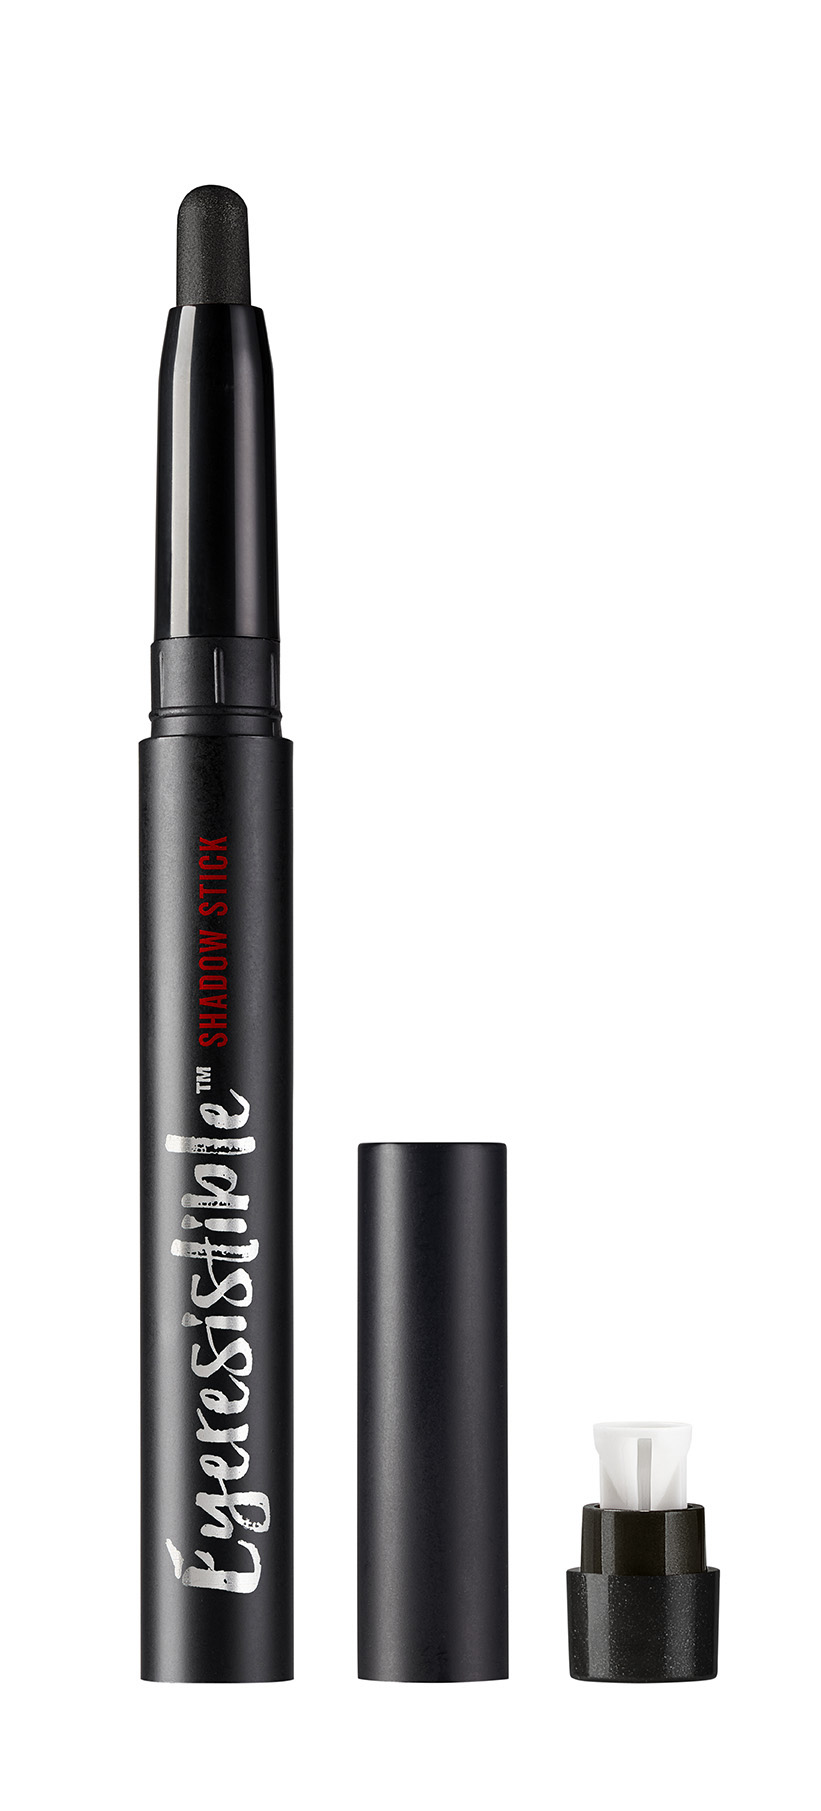 Eyeresistible Shadow Stick Smokey Black